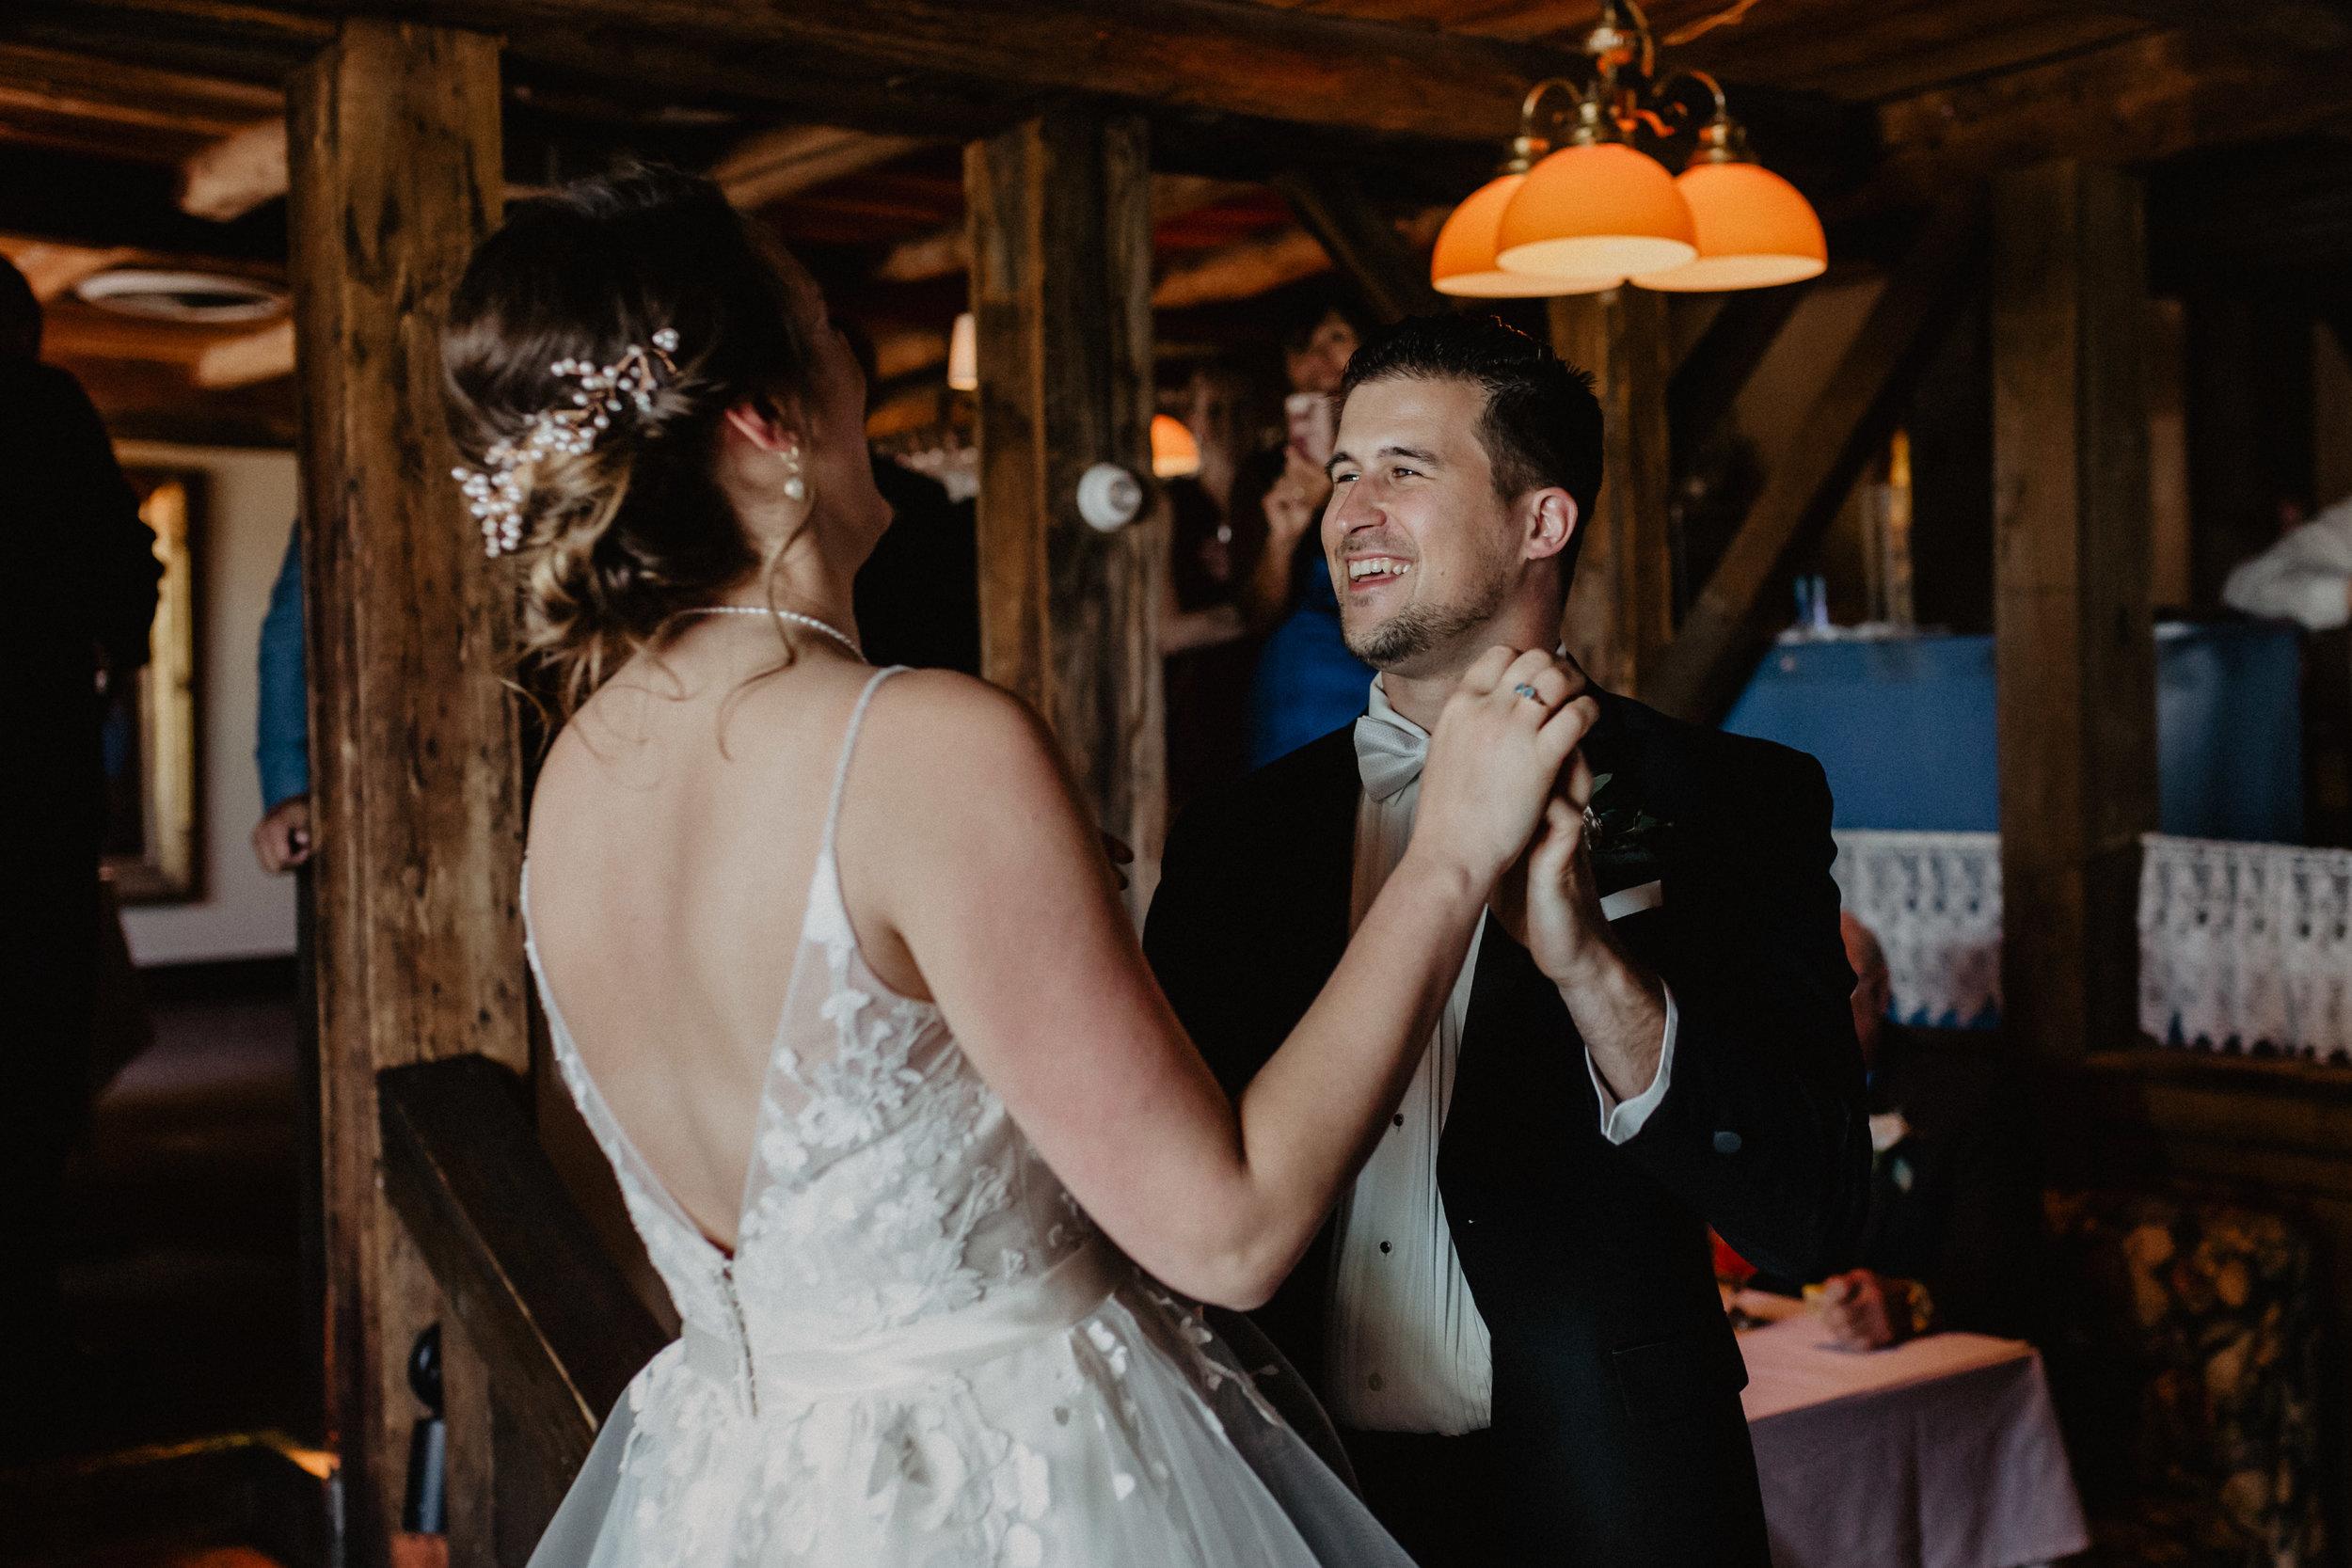 upstate_ny_wedding-45.jpg